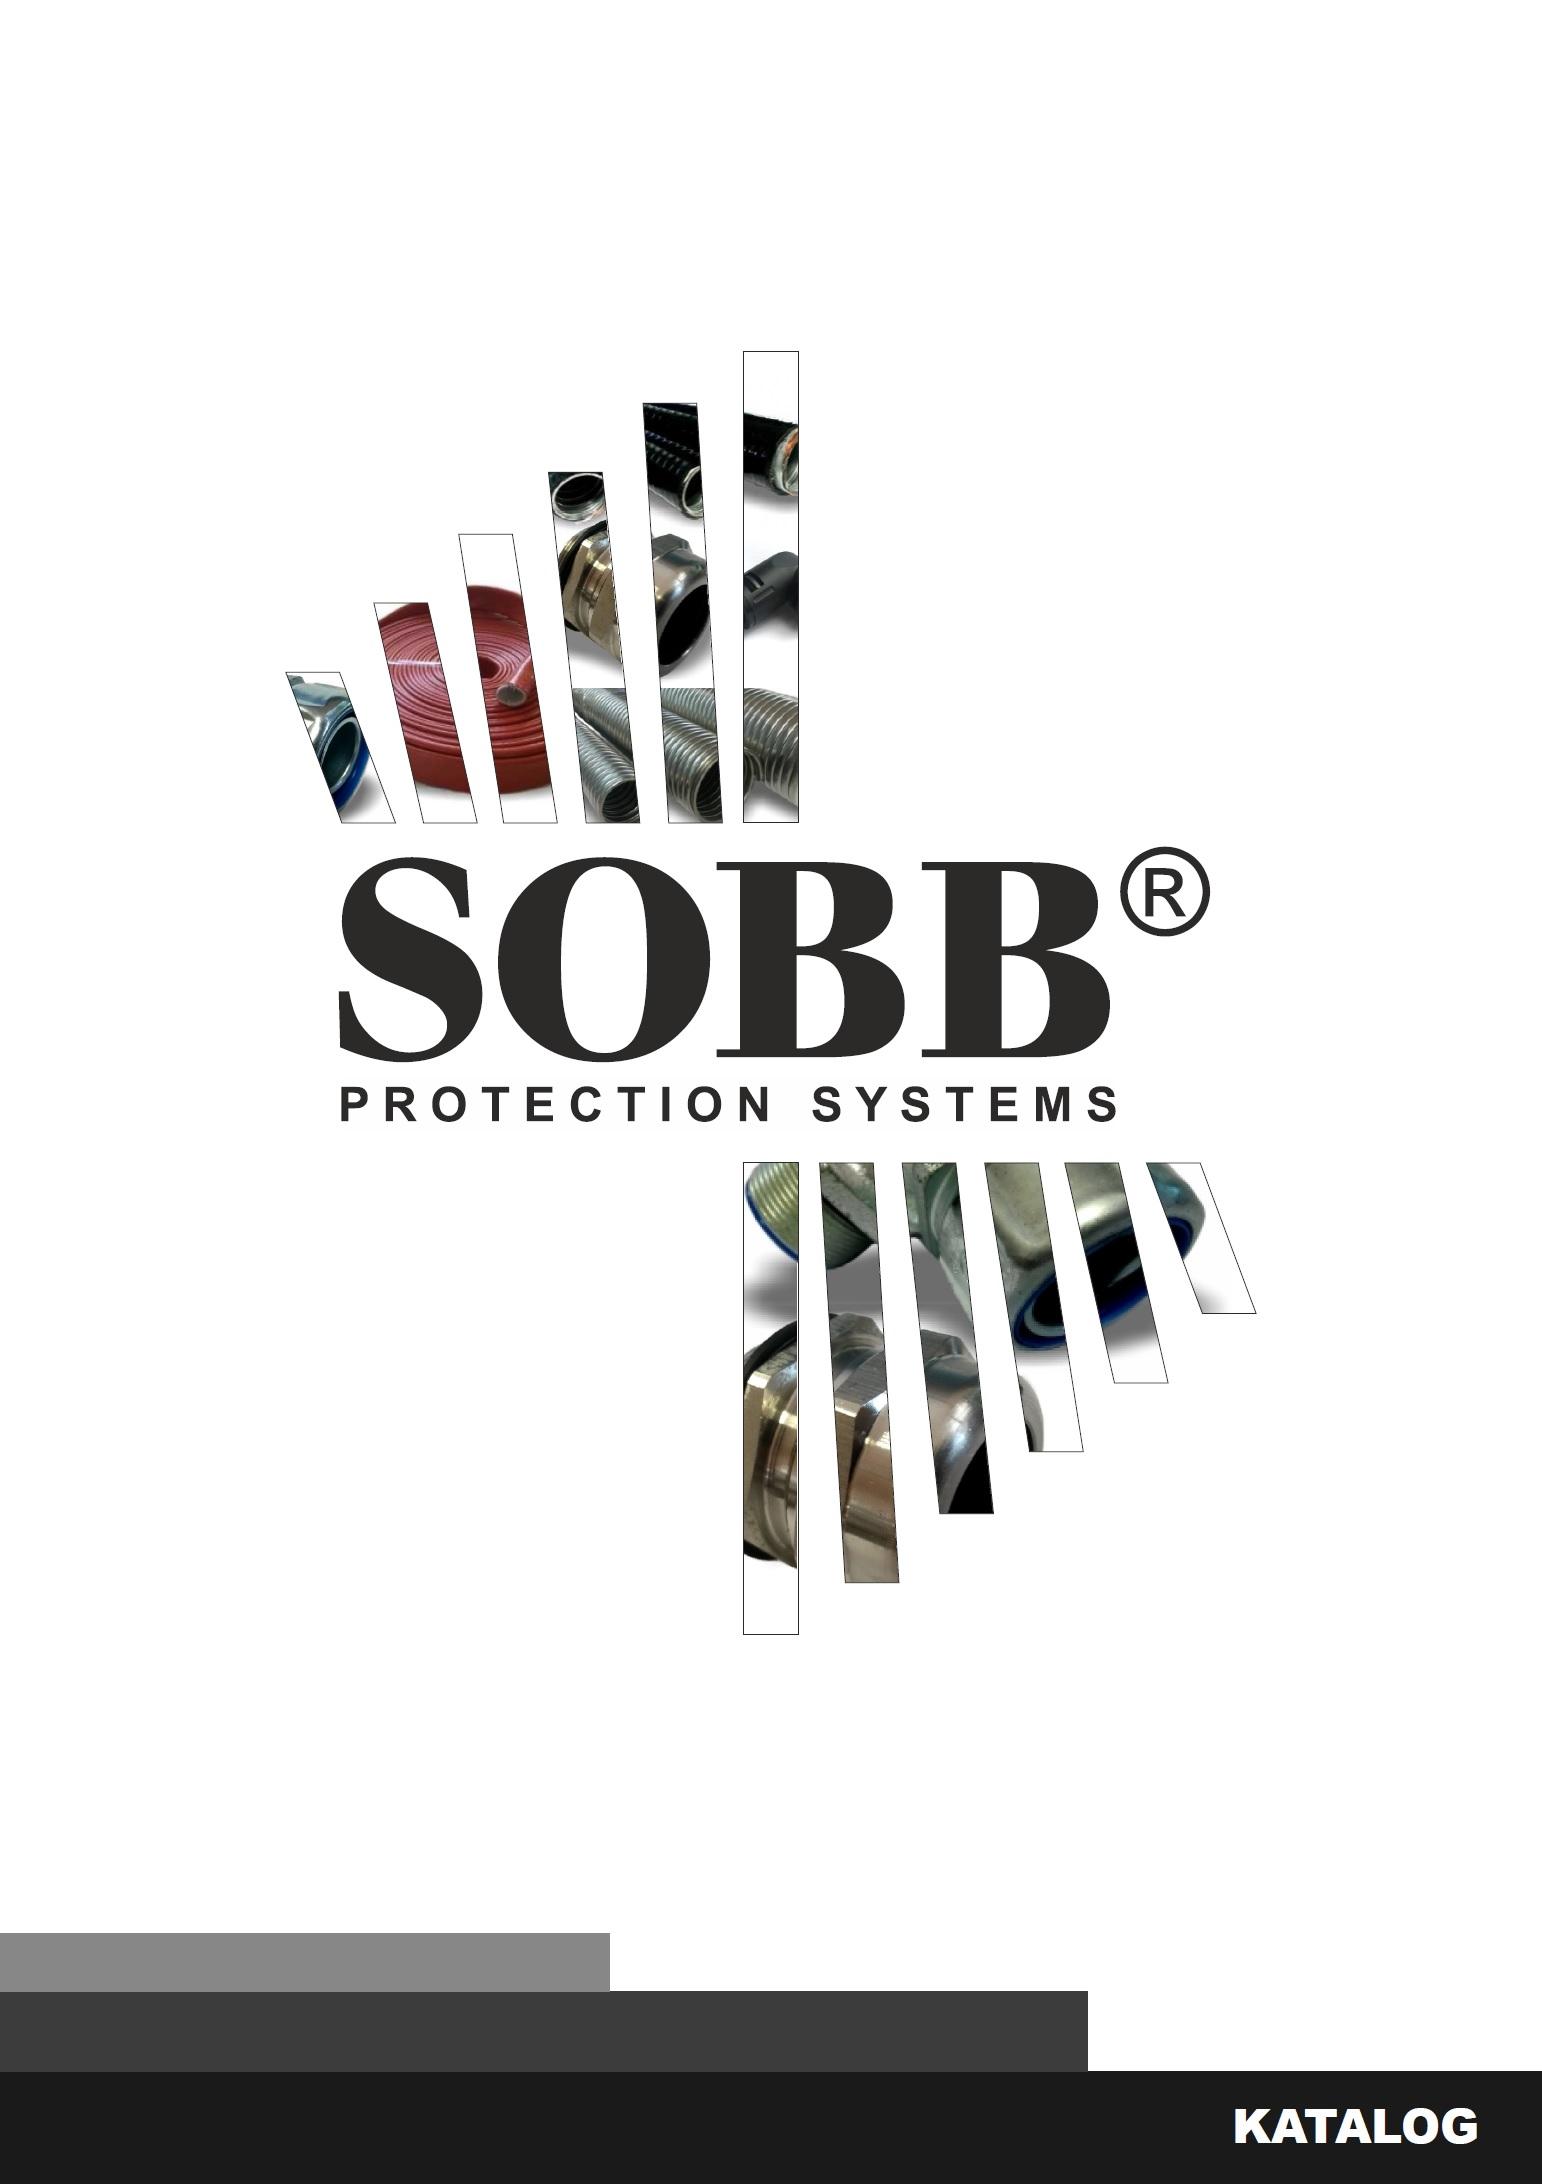 Katalog SOBB